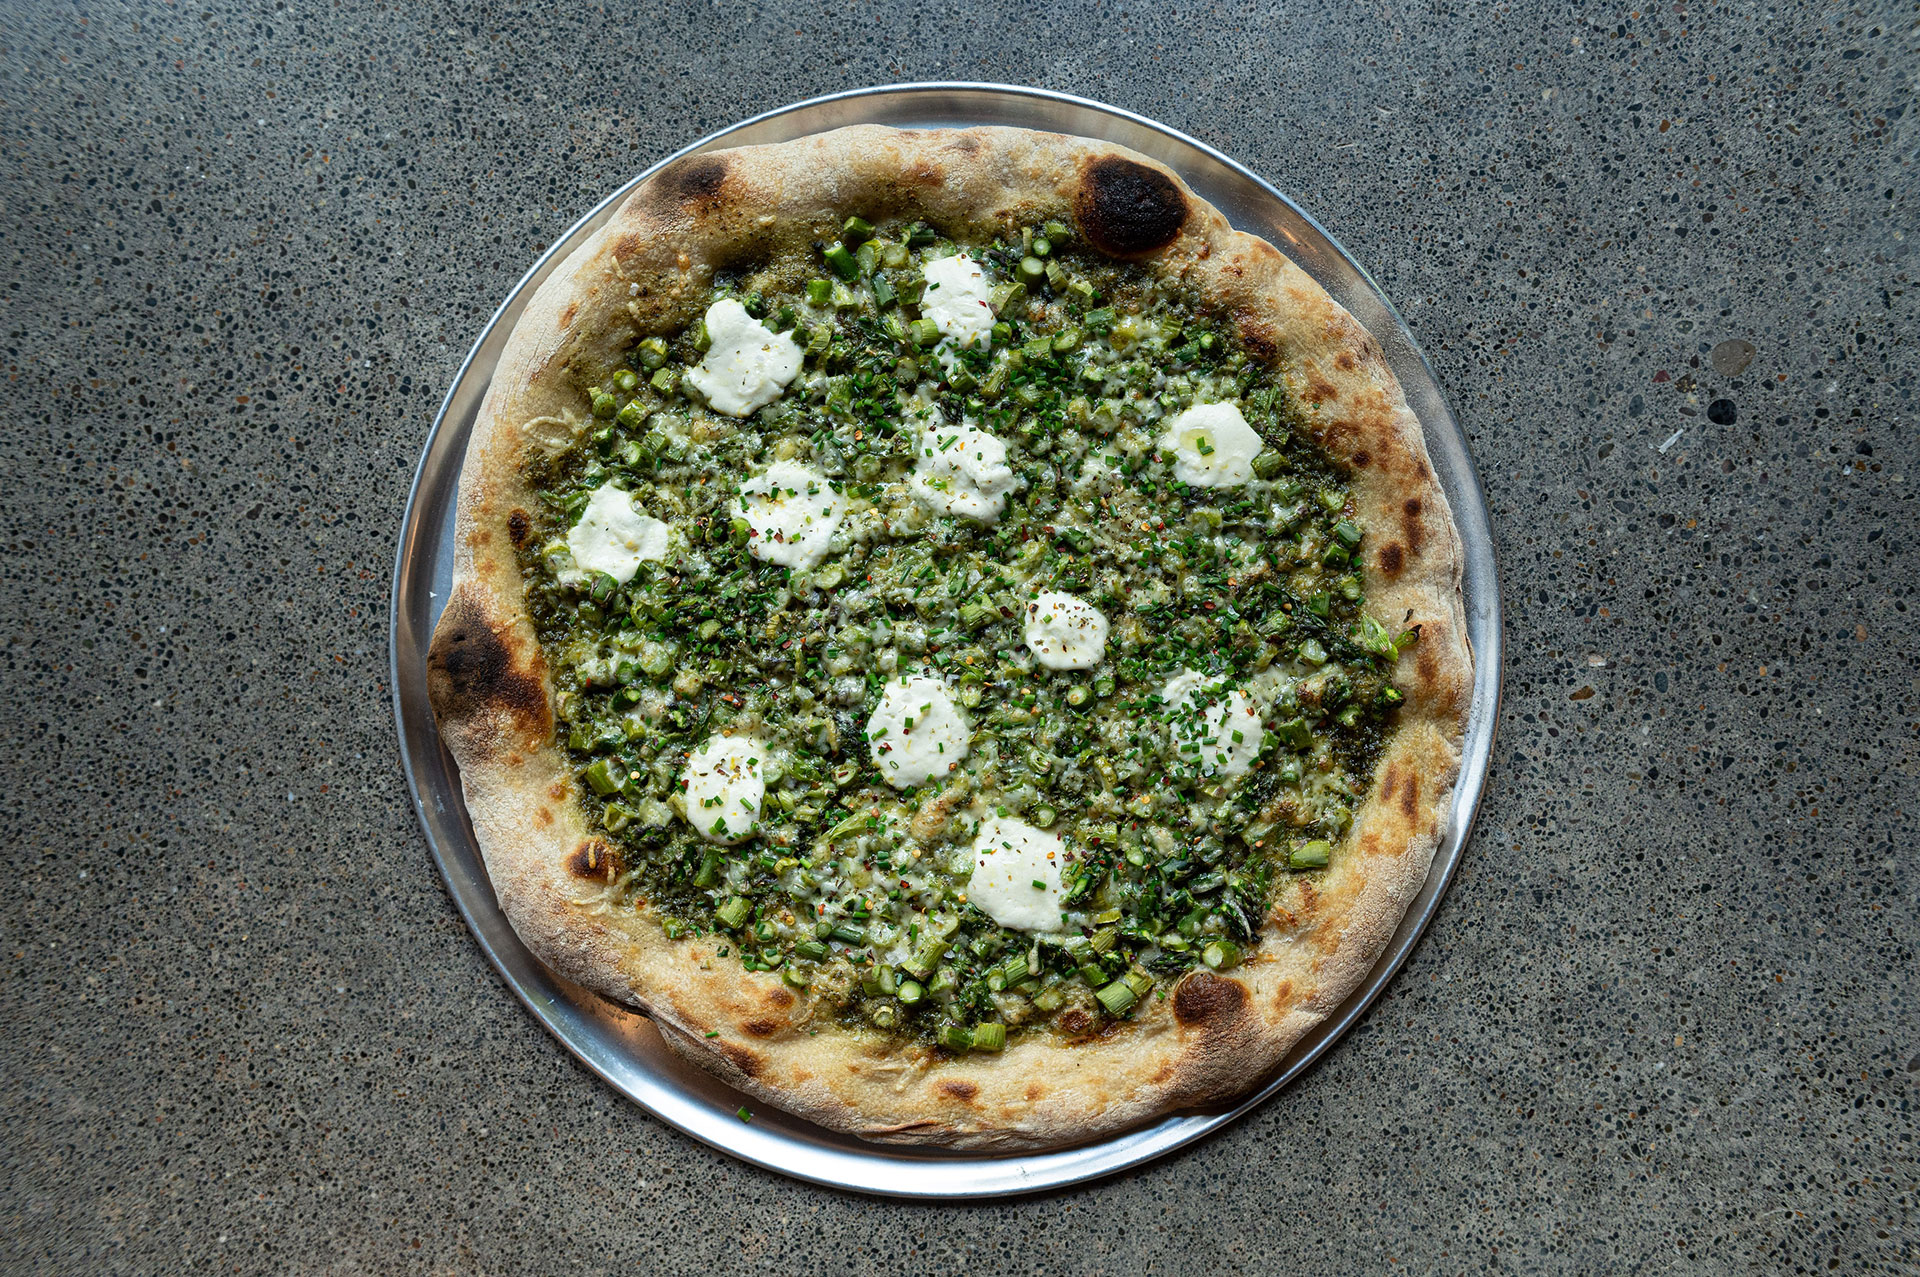 pizza-thief-pesto-pizza-top-shot